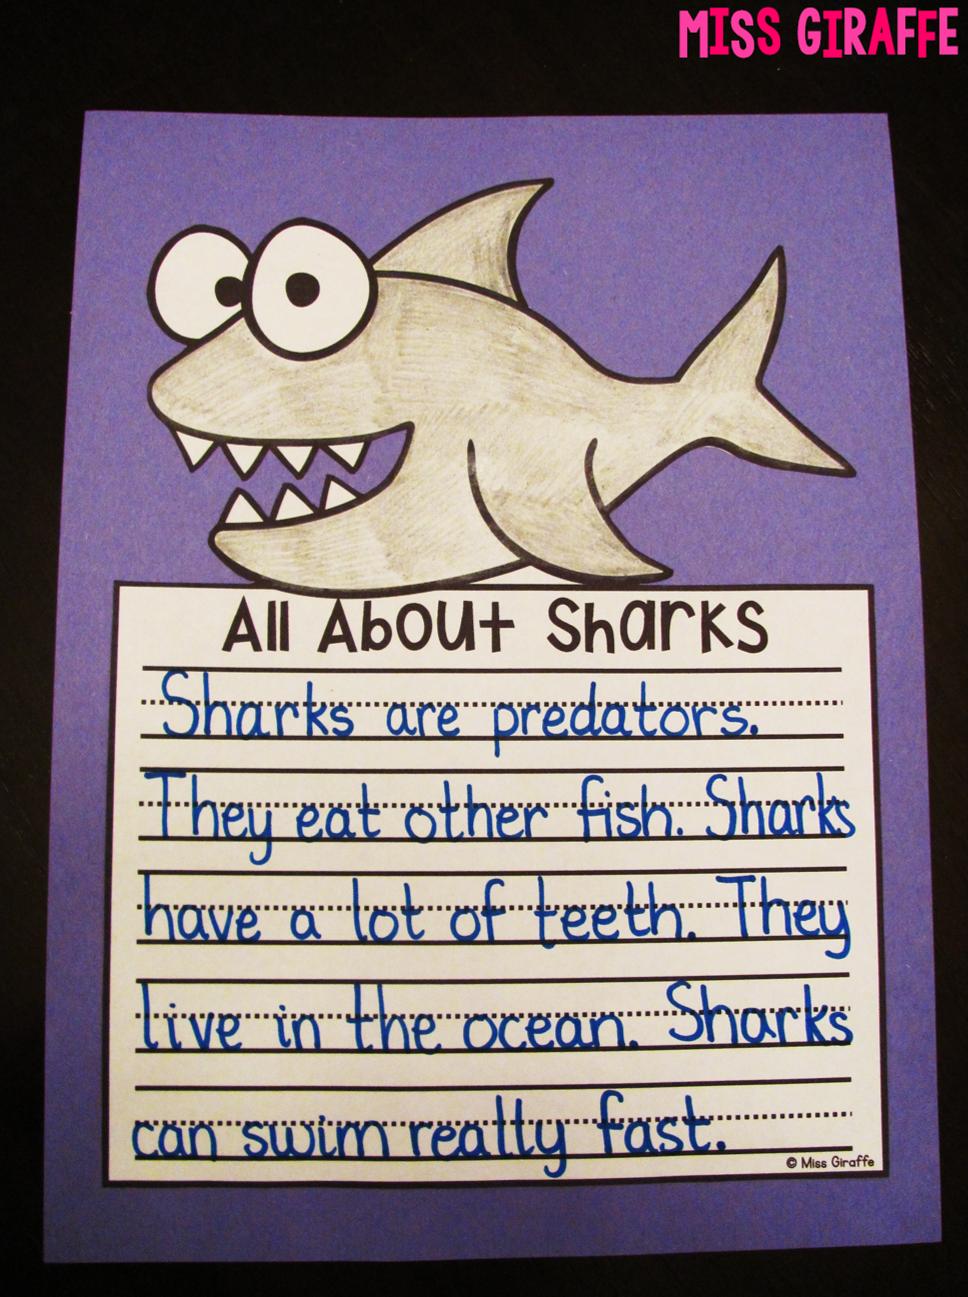 018 Essay Example Shark Wonderful Essayshark Sign Up Topics Questions Full